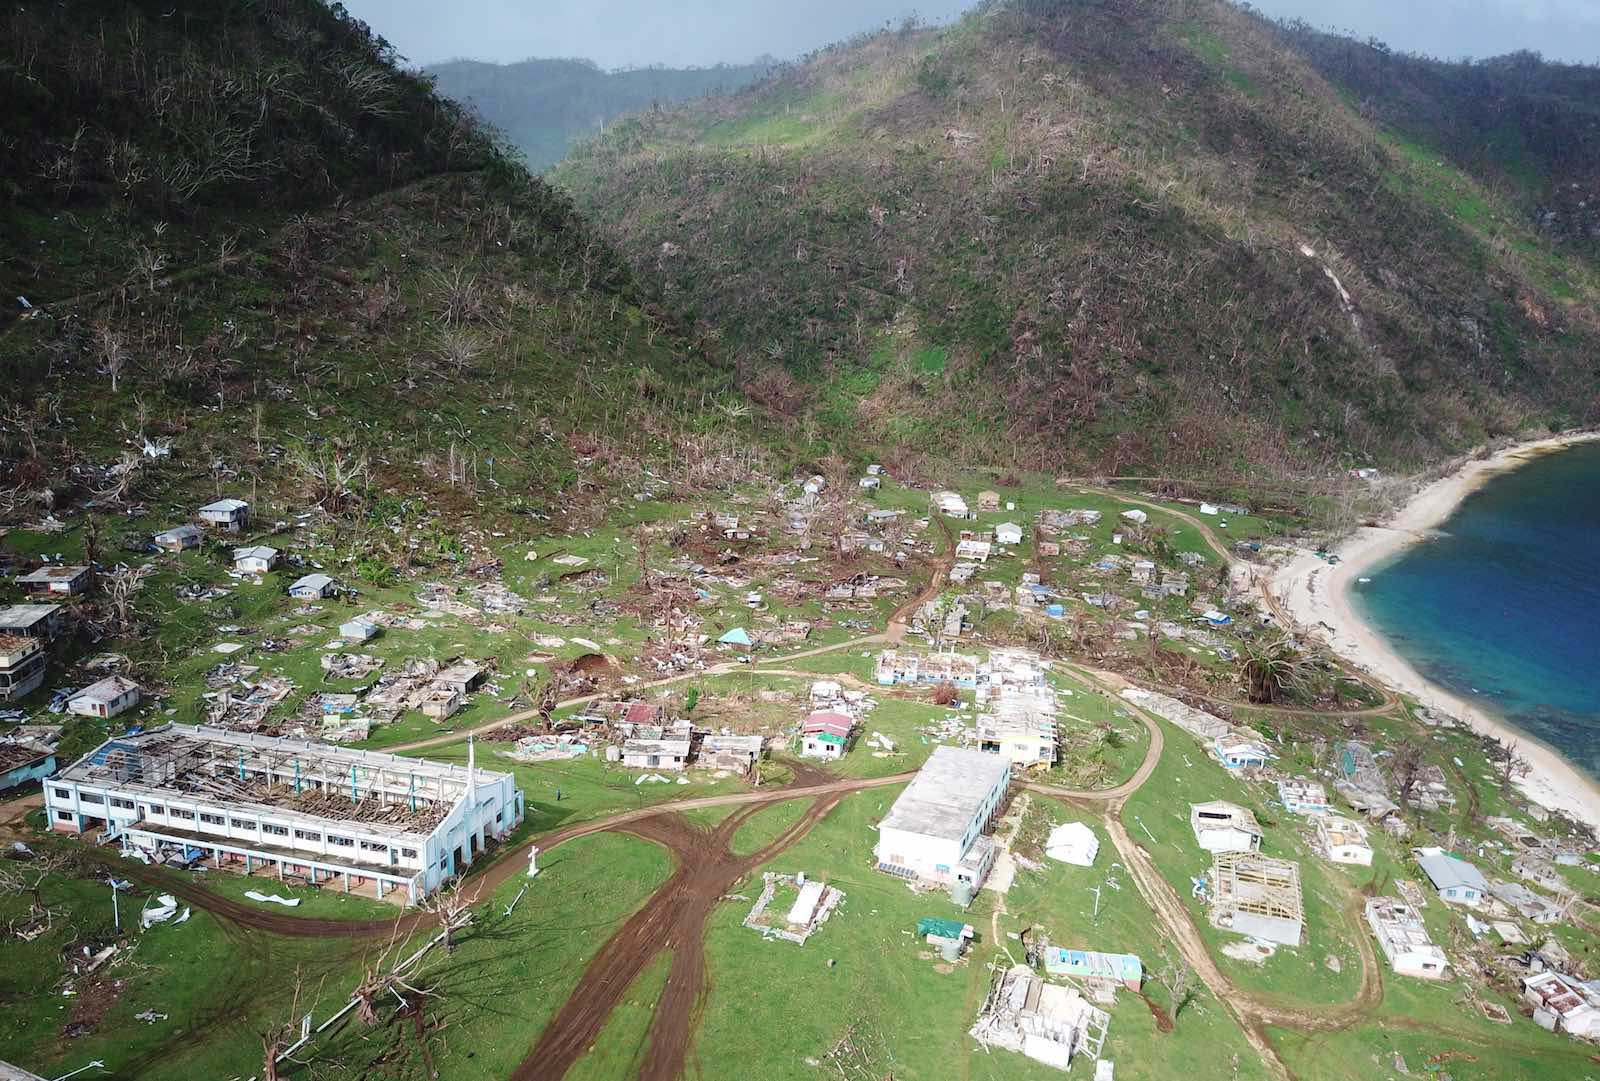 Aftermath of Cyclone Harold in Melsisi settlement, Pentecost Island, Vanuatu (Ginny Stein/RedR/NDMO Vanuatu)